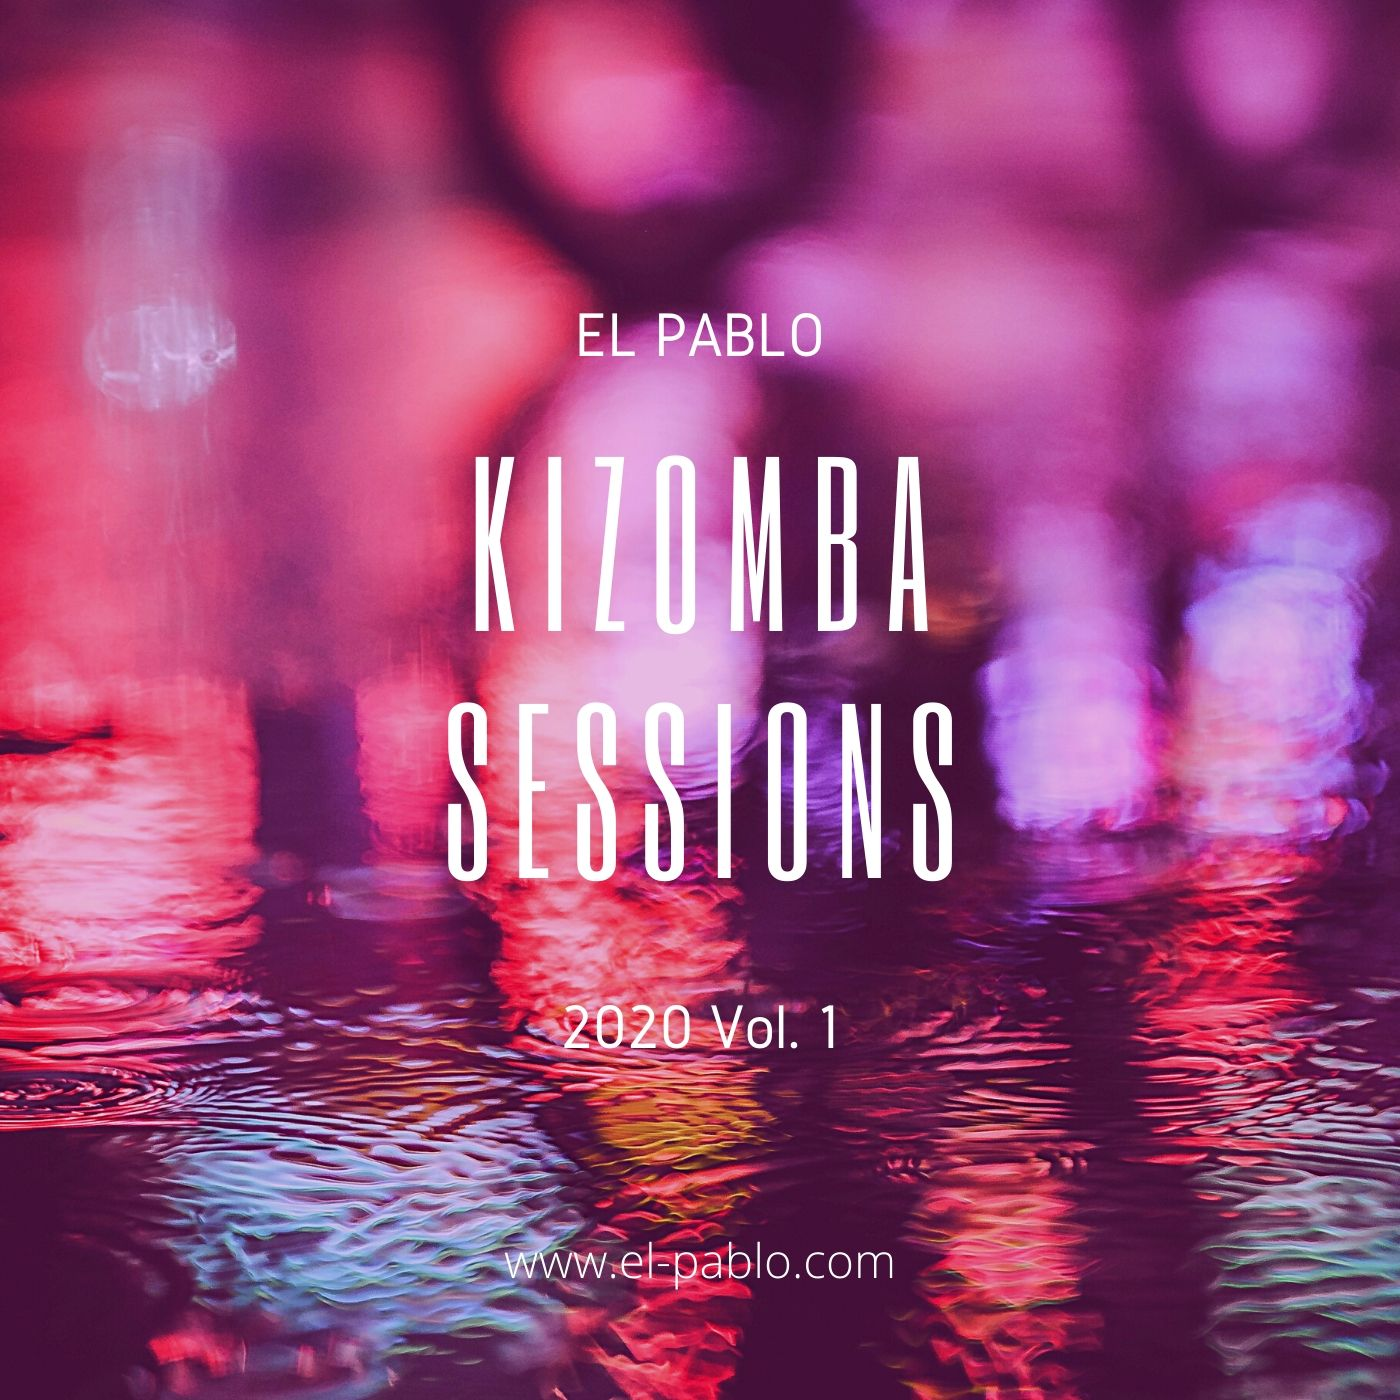 Cover Kizomba Sessions 2020 Vol. 1